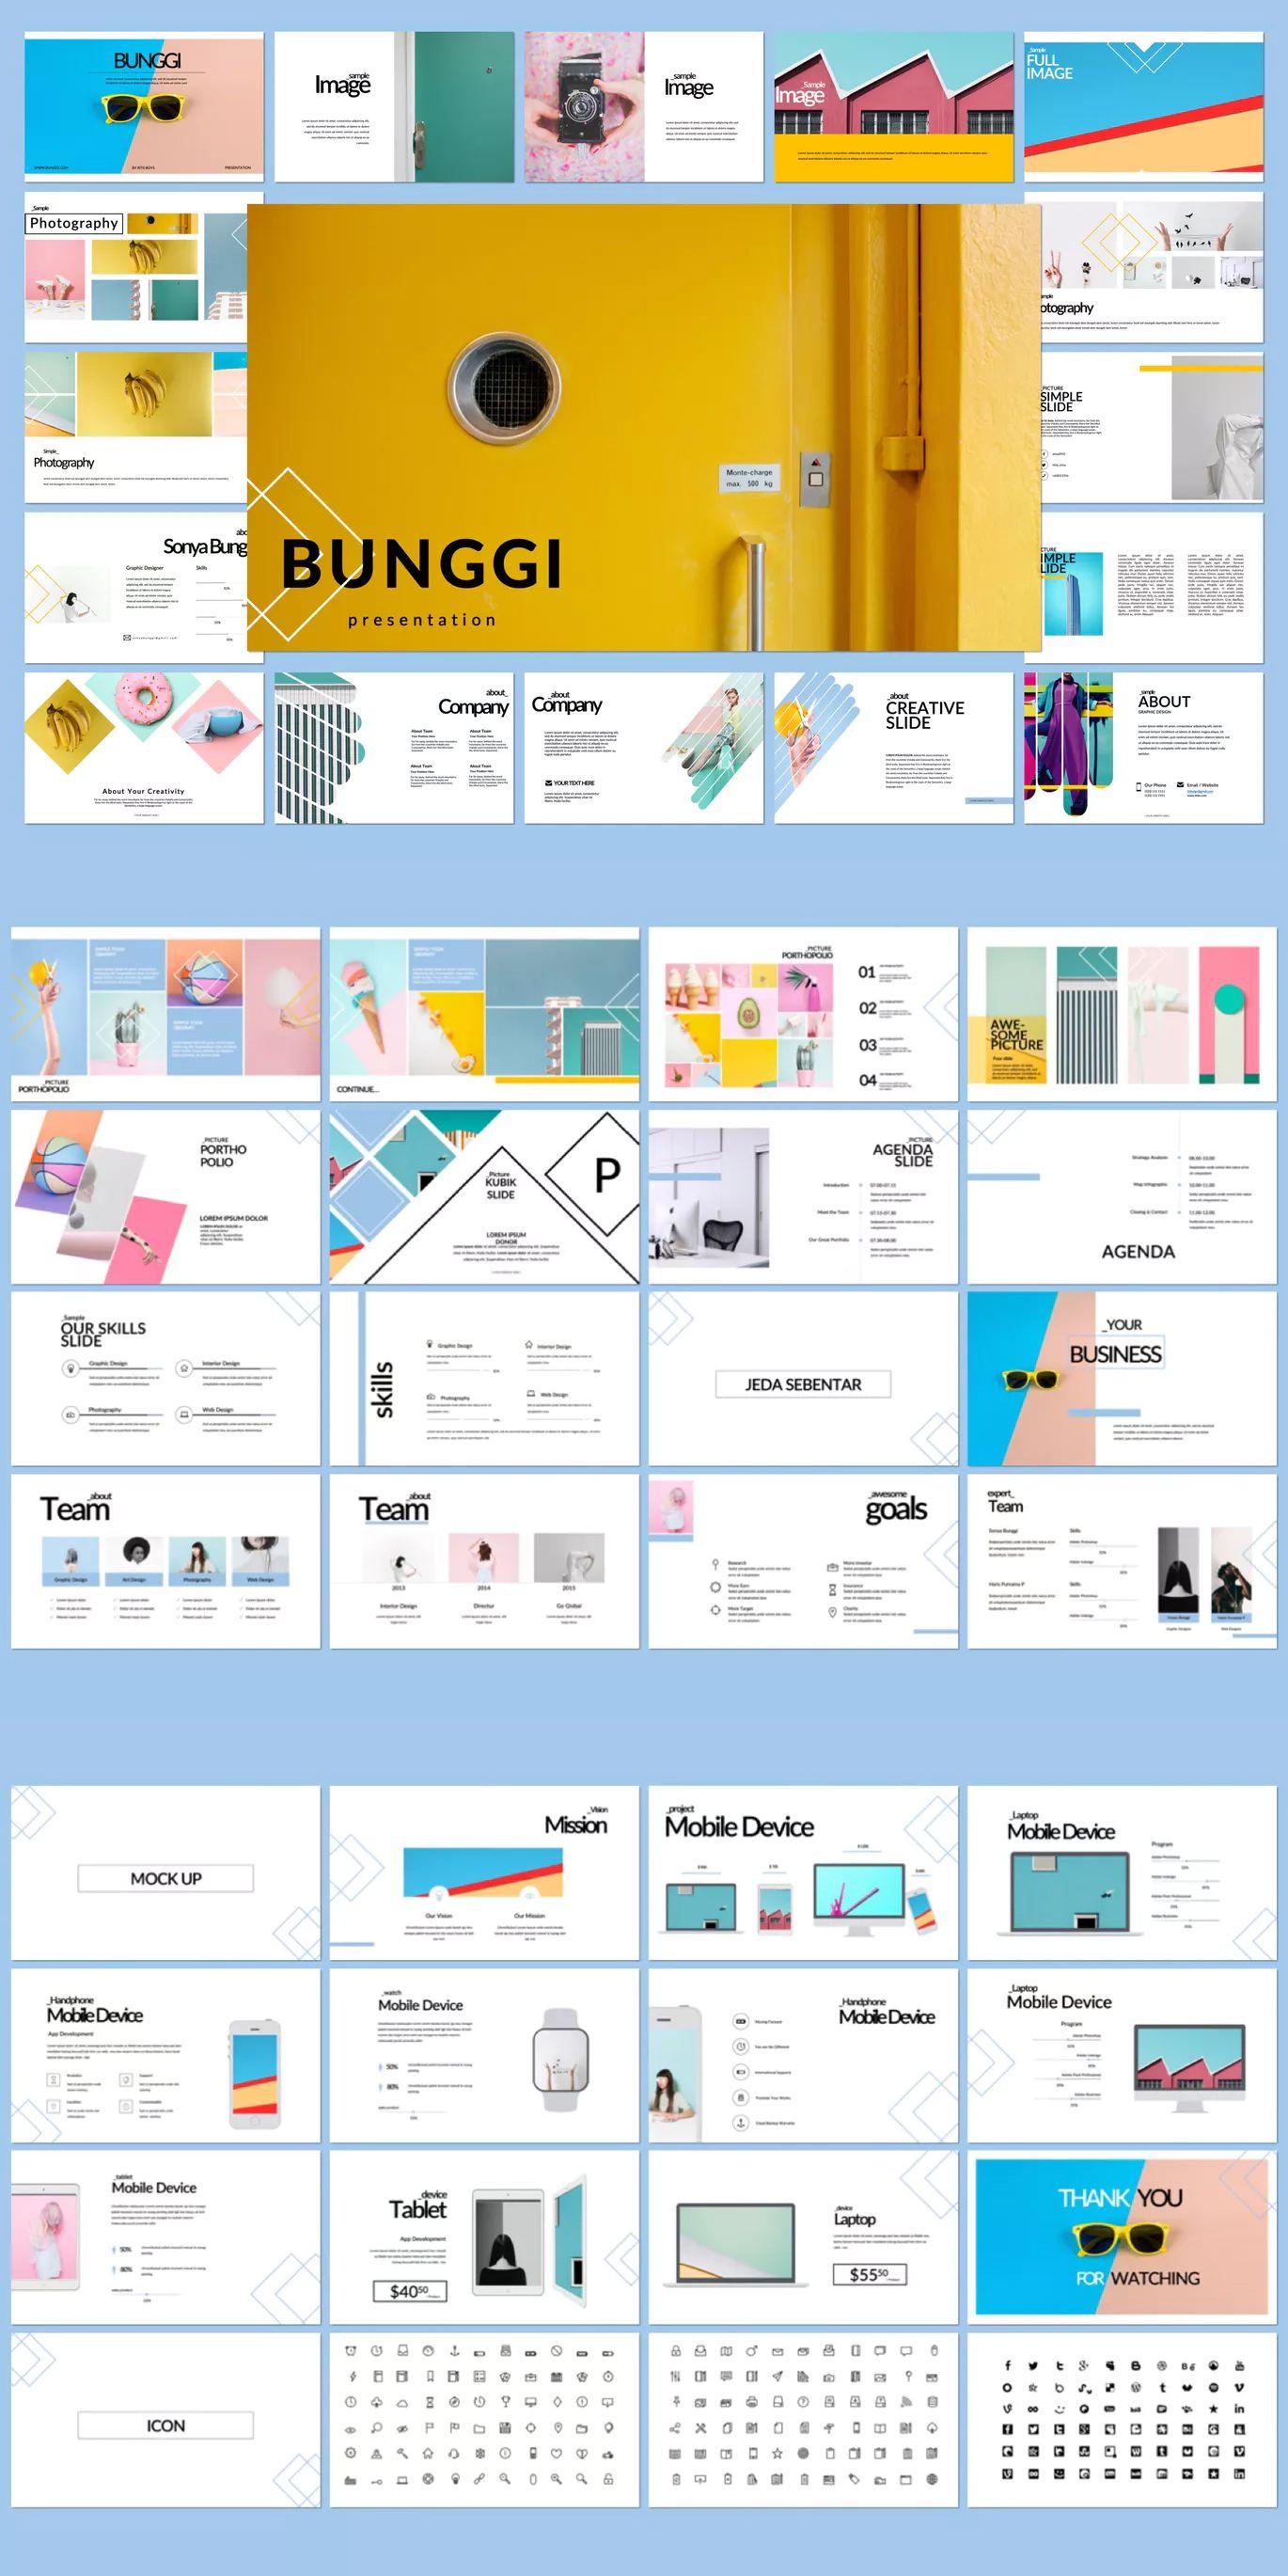 bunggi powerpoint presentation template download powerpoint